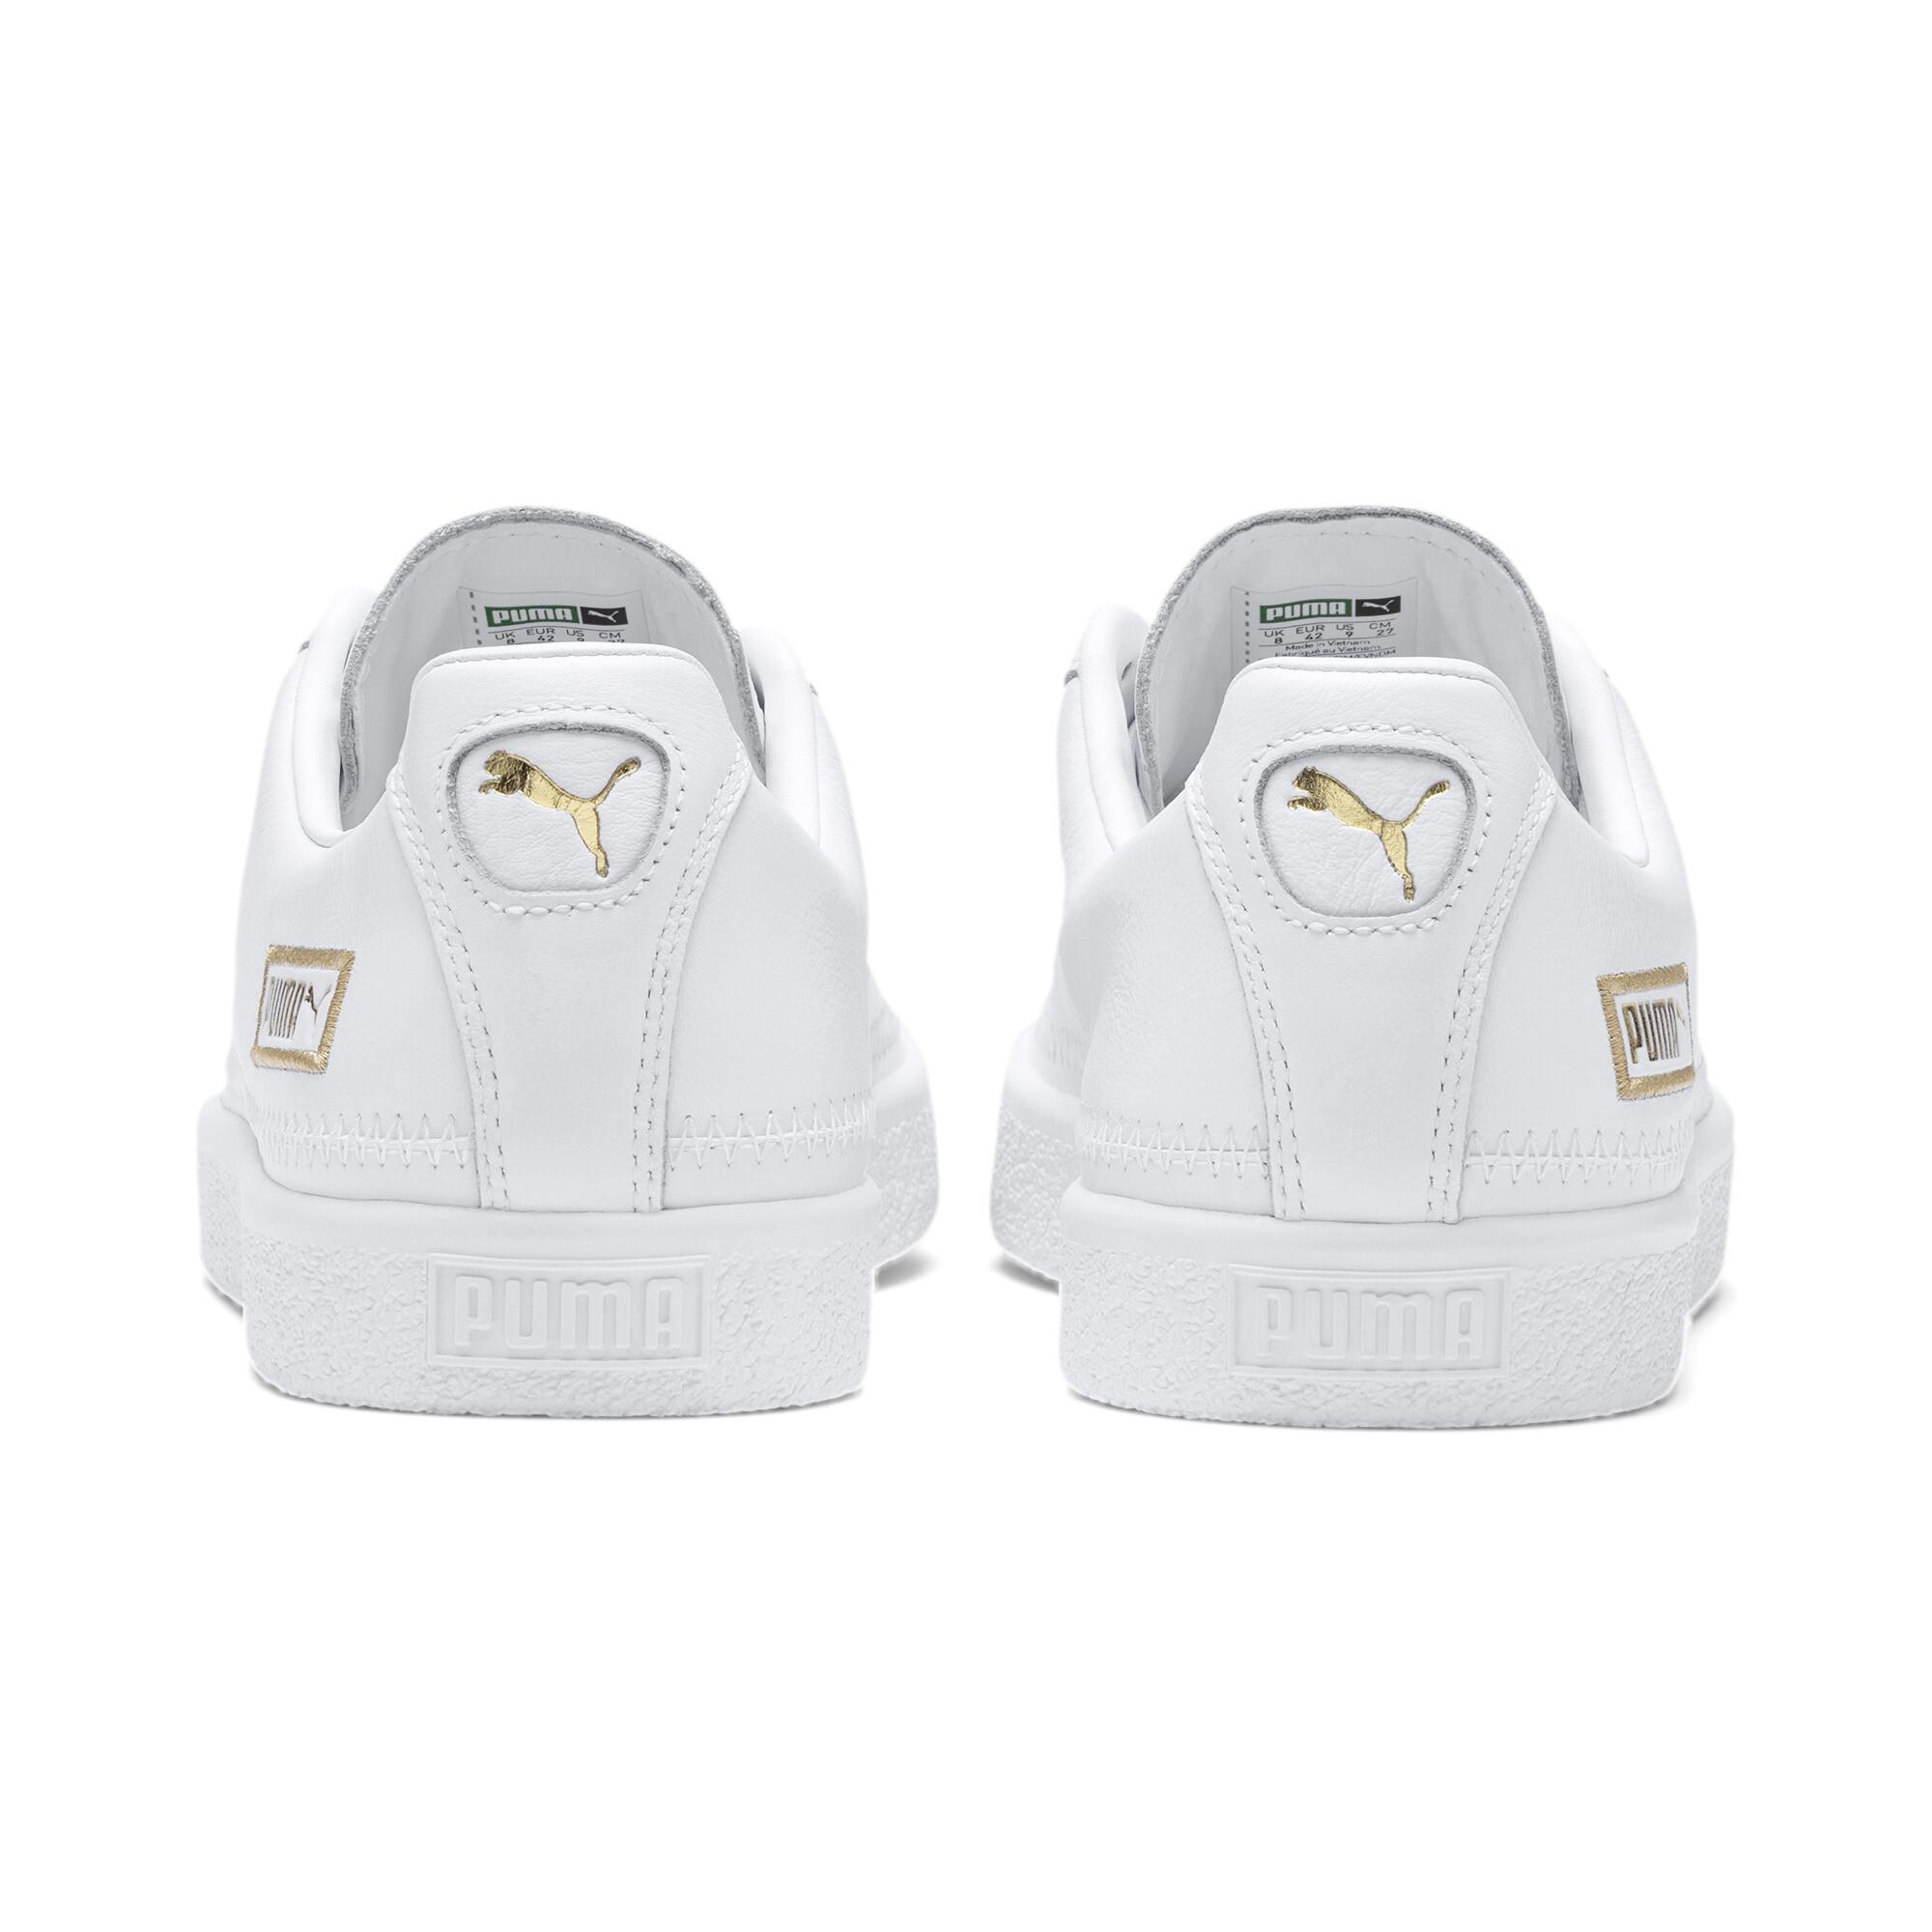 PUMA-Basket-Stitch-Sneaker-Unisex-Schuhe-Neu Indexbild 3